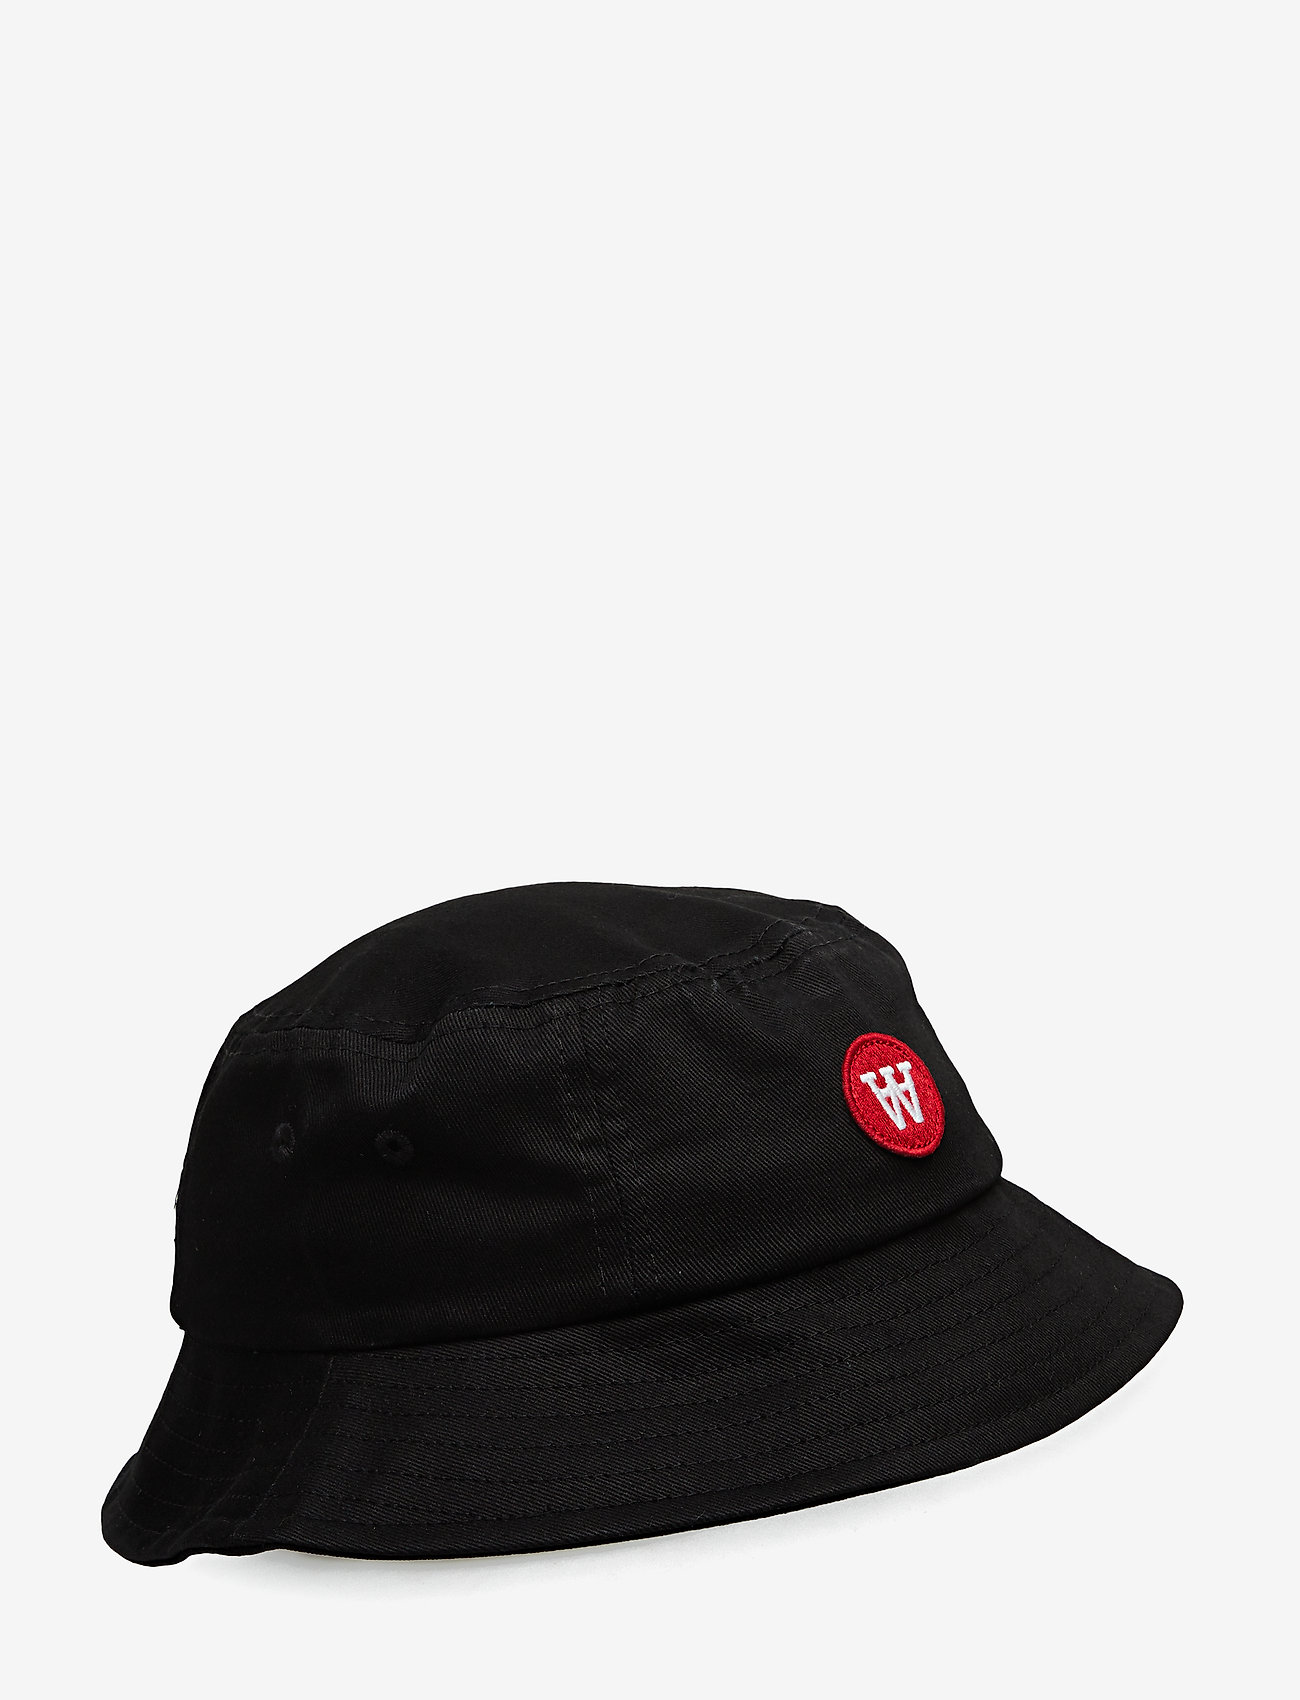 Wood Wood - Val kids bucket hat - solhat - black - 0